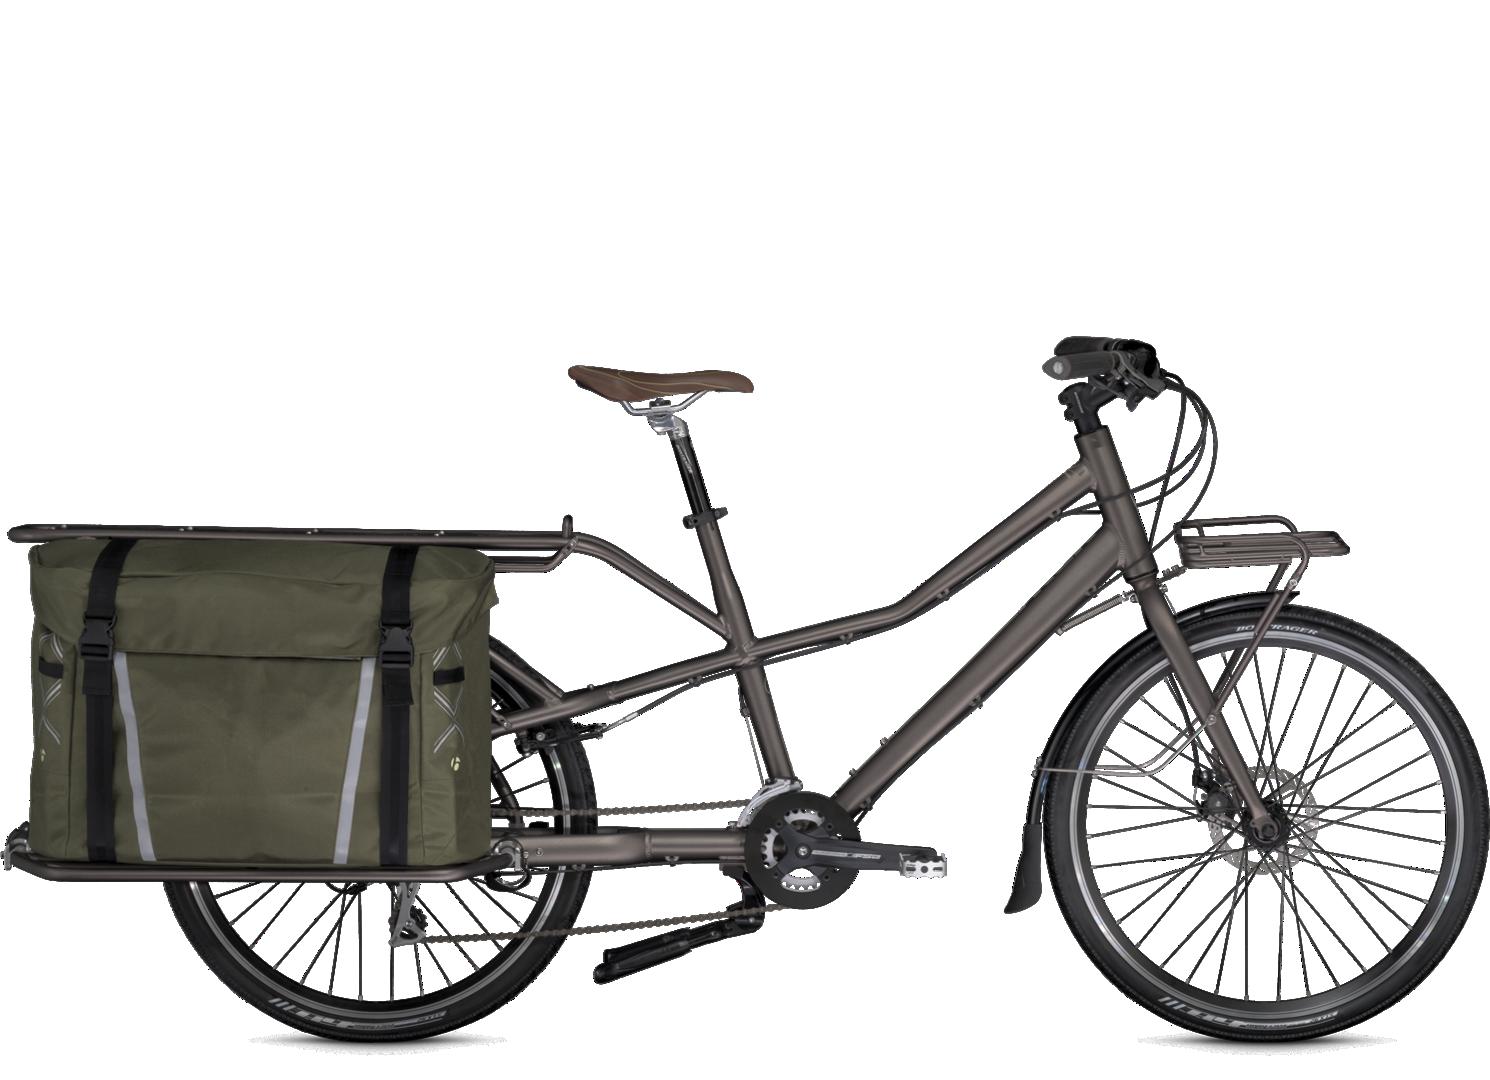 2014 Transport Bike Archive Trek Bicycle